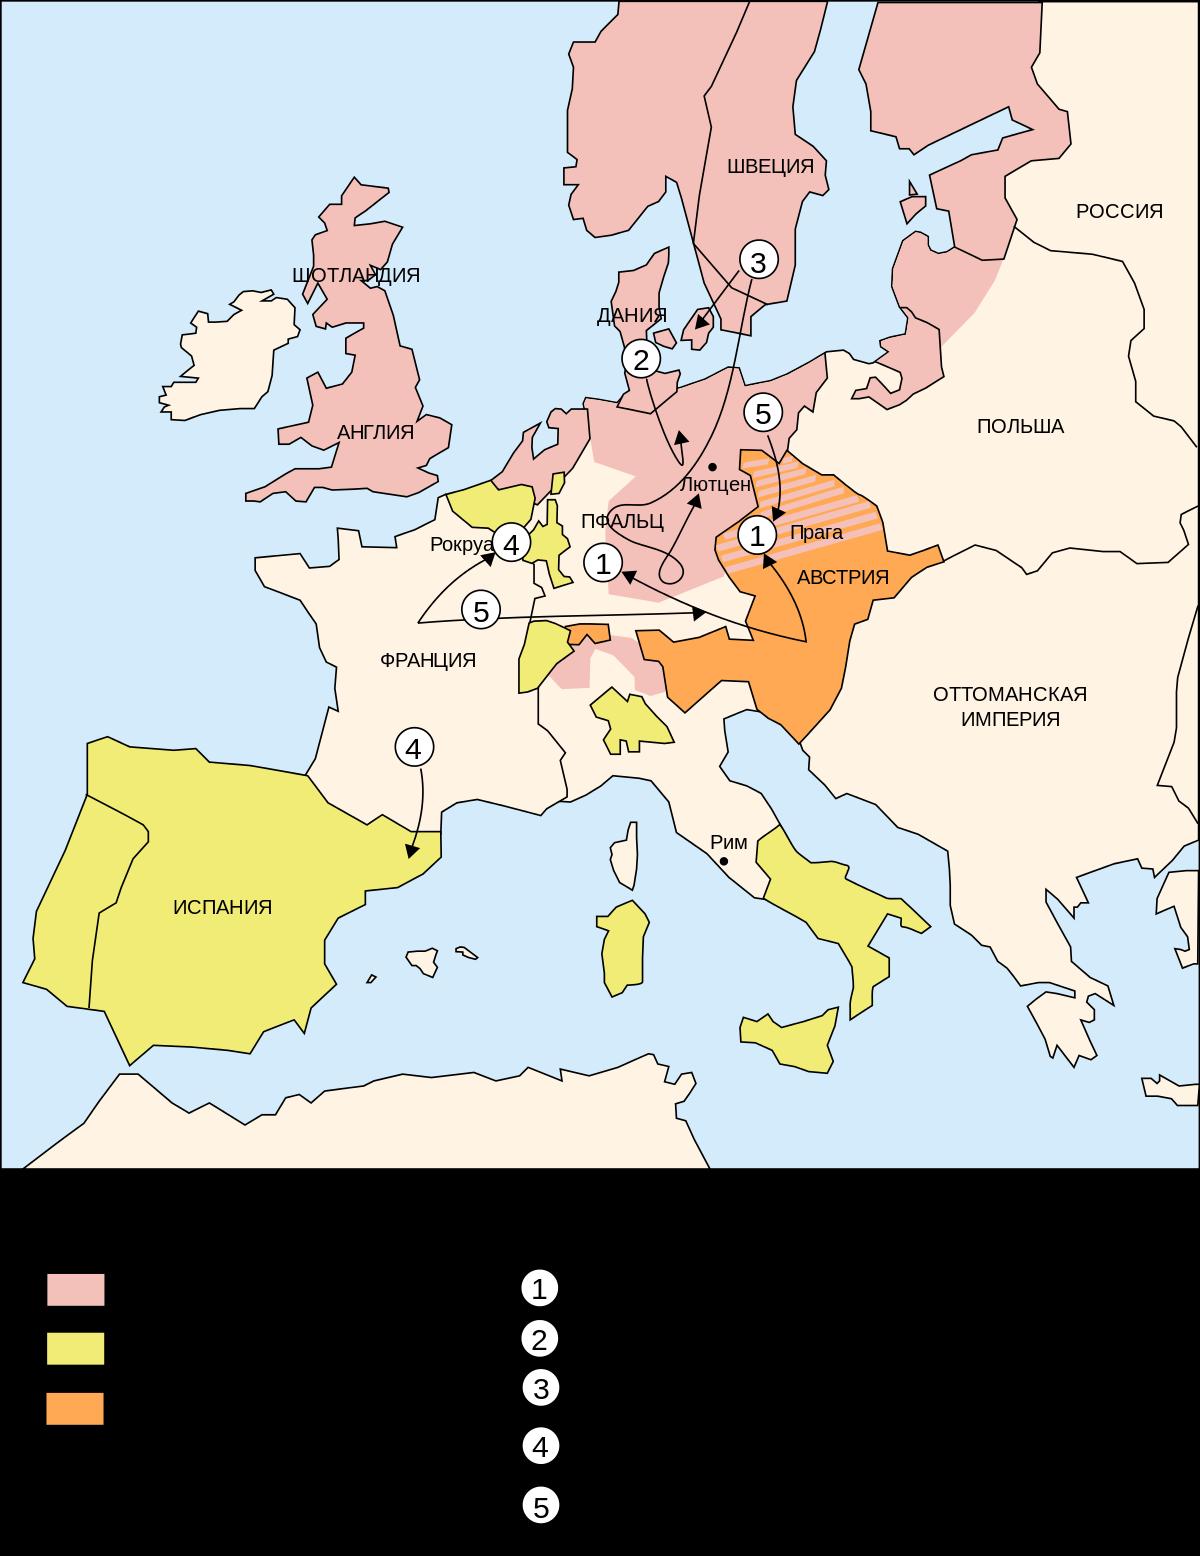 Реформация и контрреформация. история австрии. культура, общество, политика